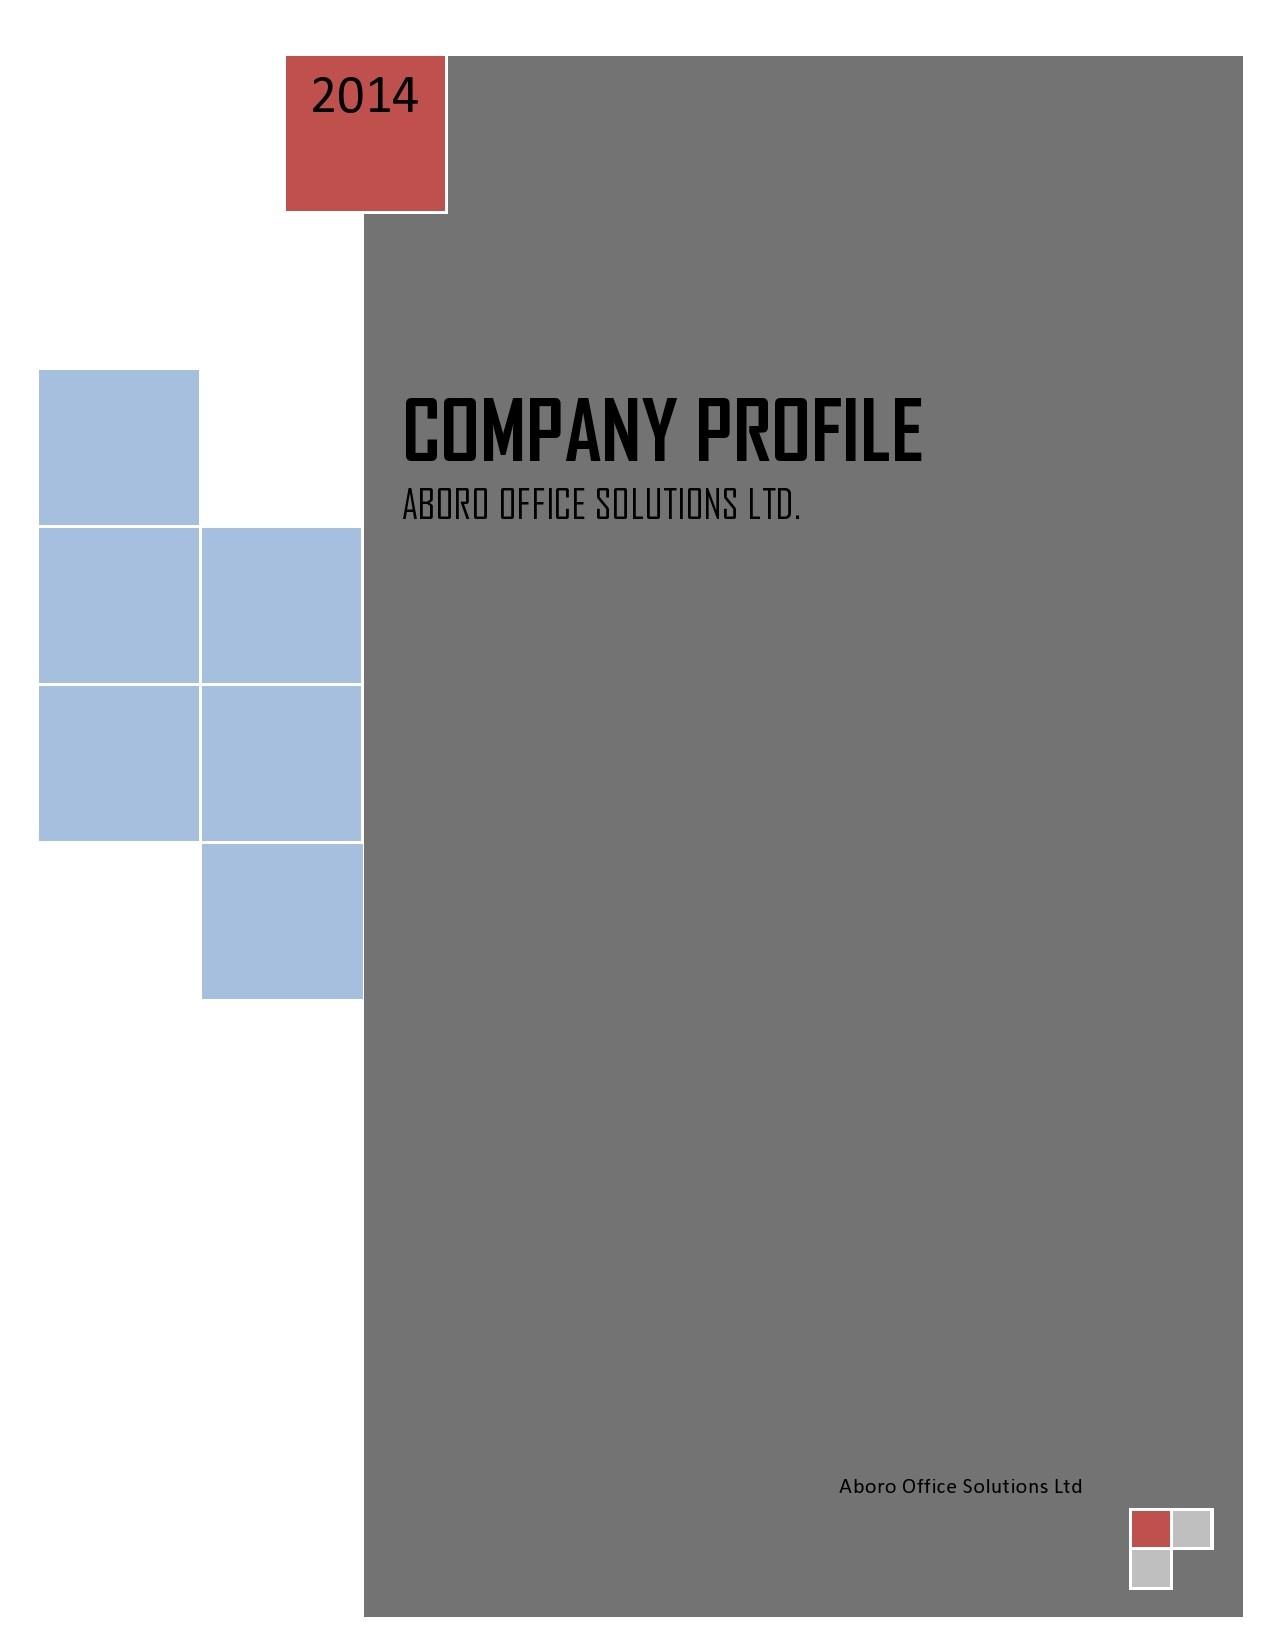 Free company profile template 06